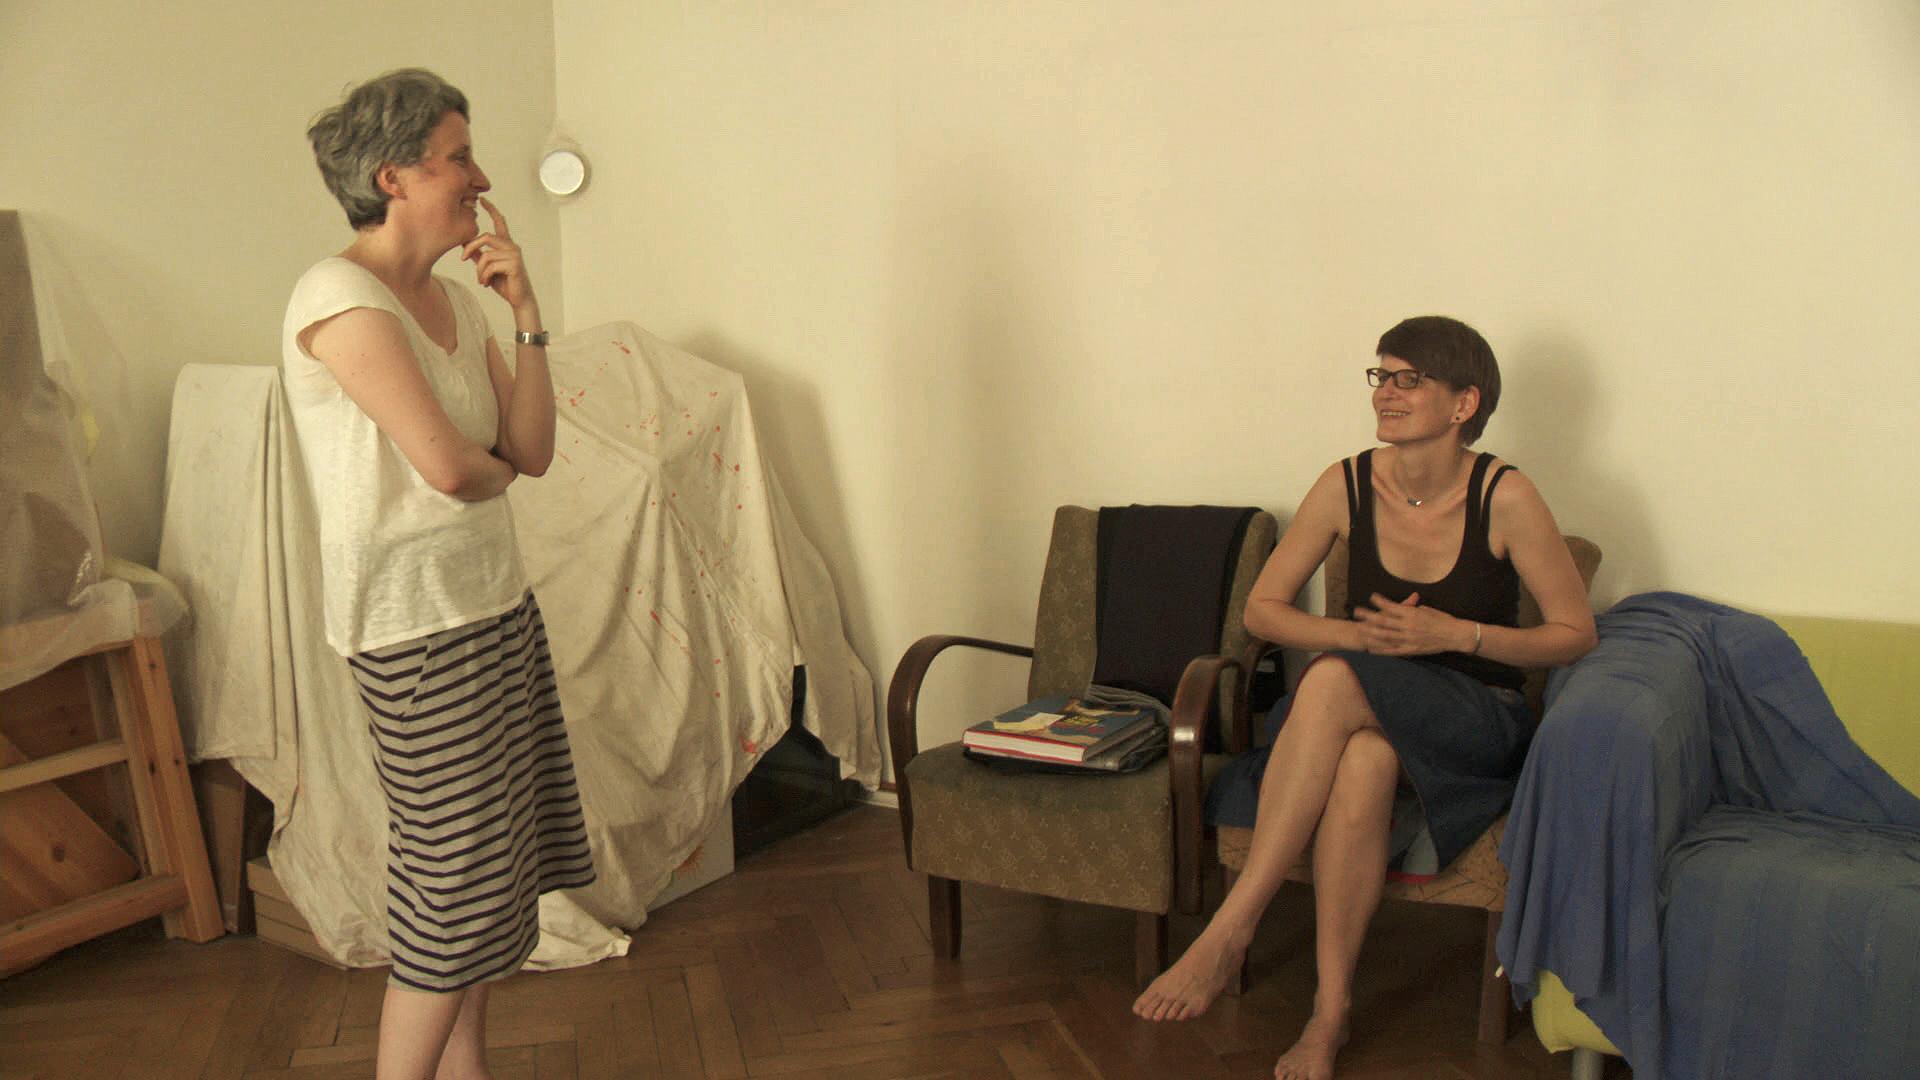 Stottern_Regie_Petra Nickel und Birgit Gohlke